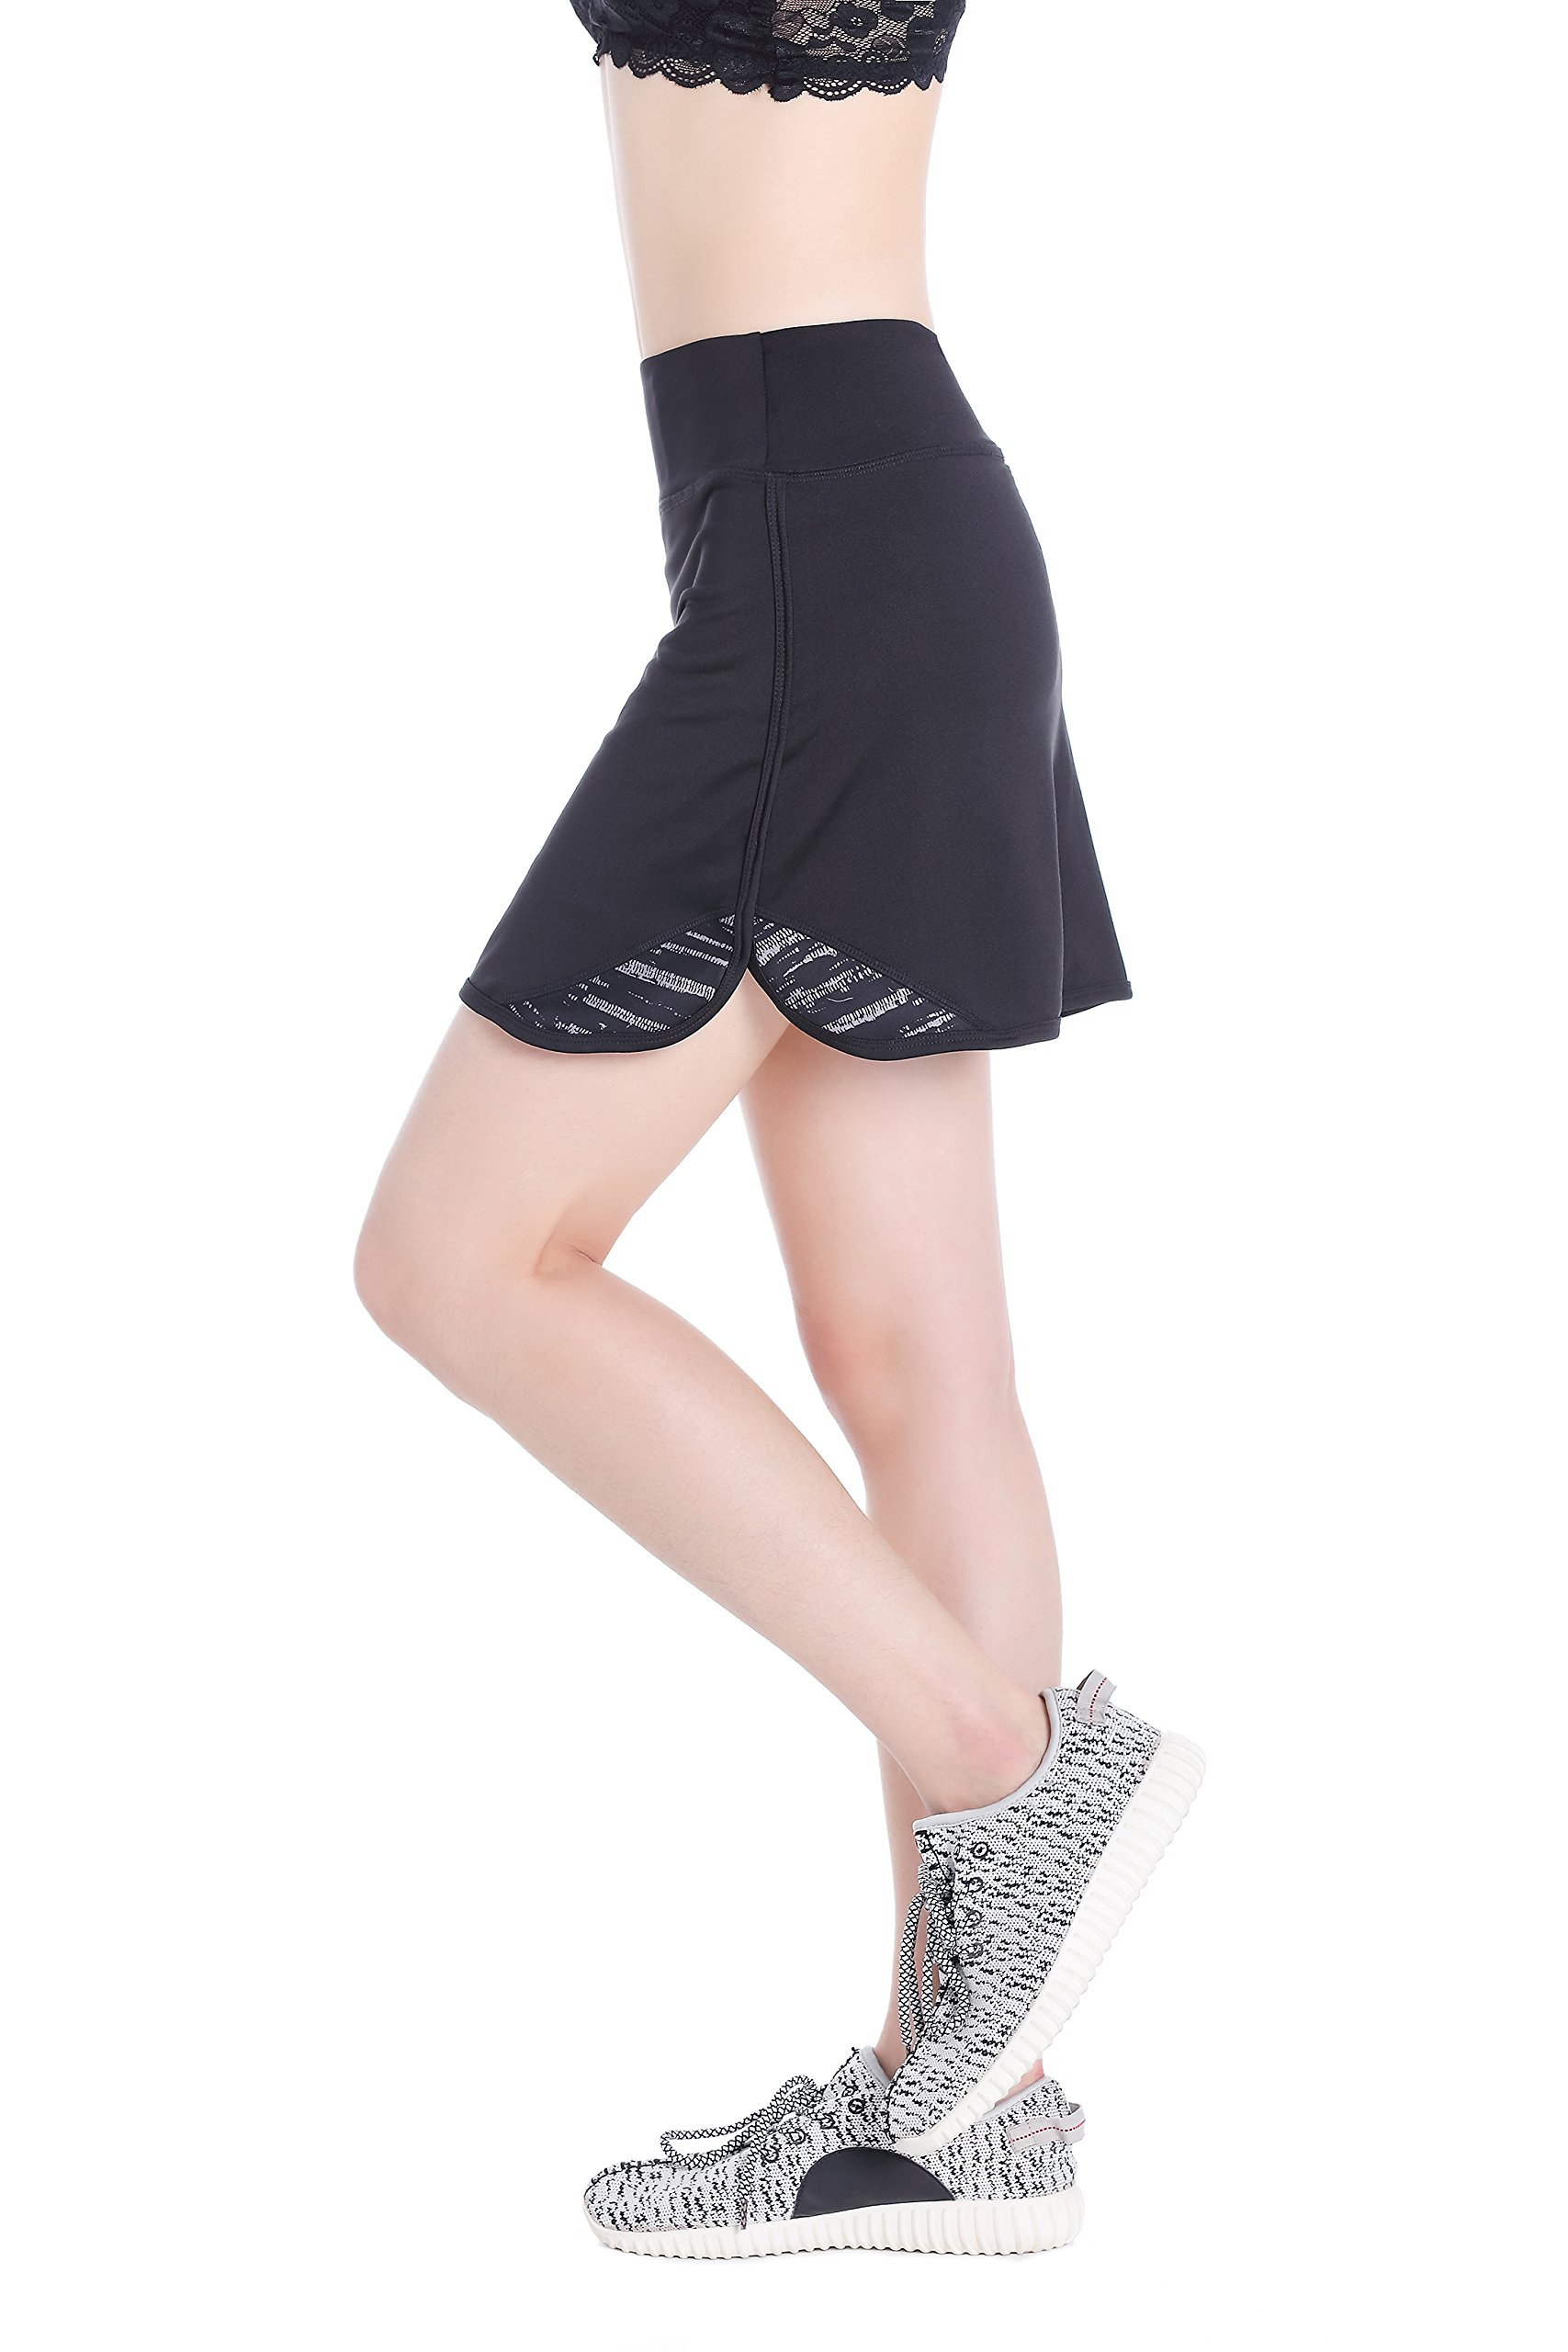 Annjoli Womens Running Skirt Casual Gym Tennis Skort for Workout, Golf, Gym (S, Black/Pattern)